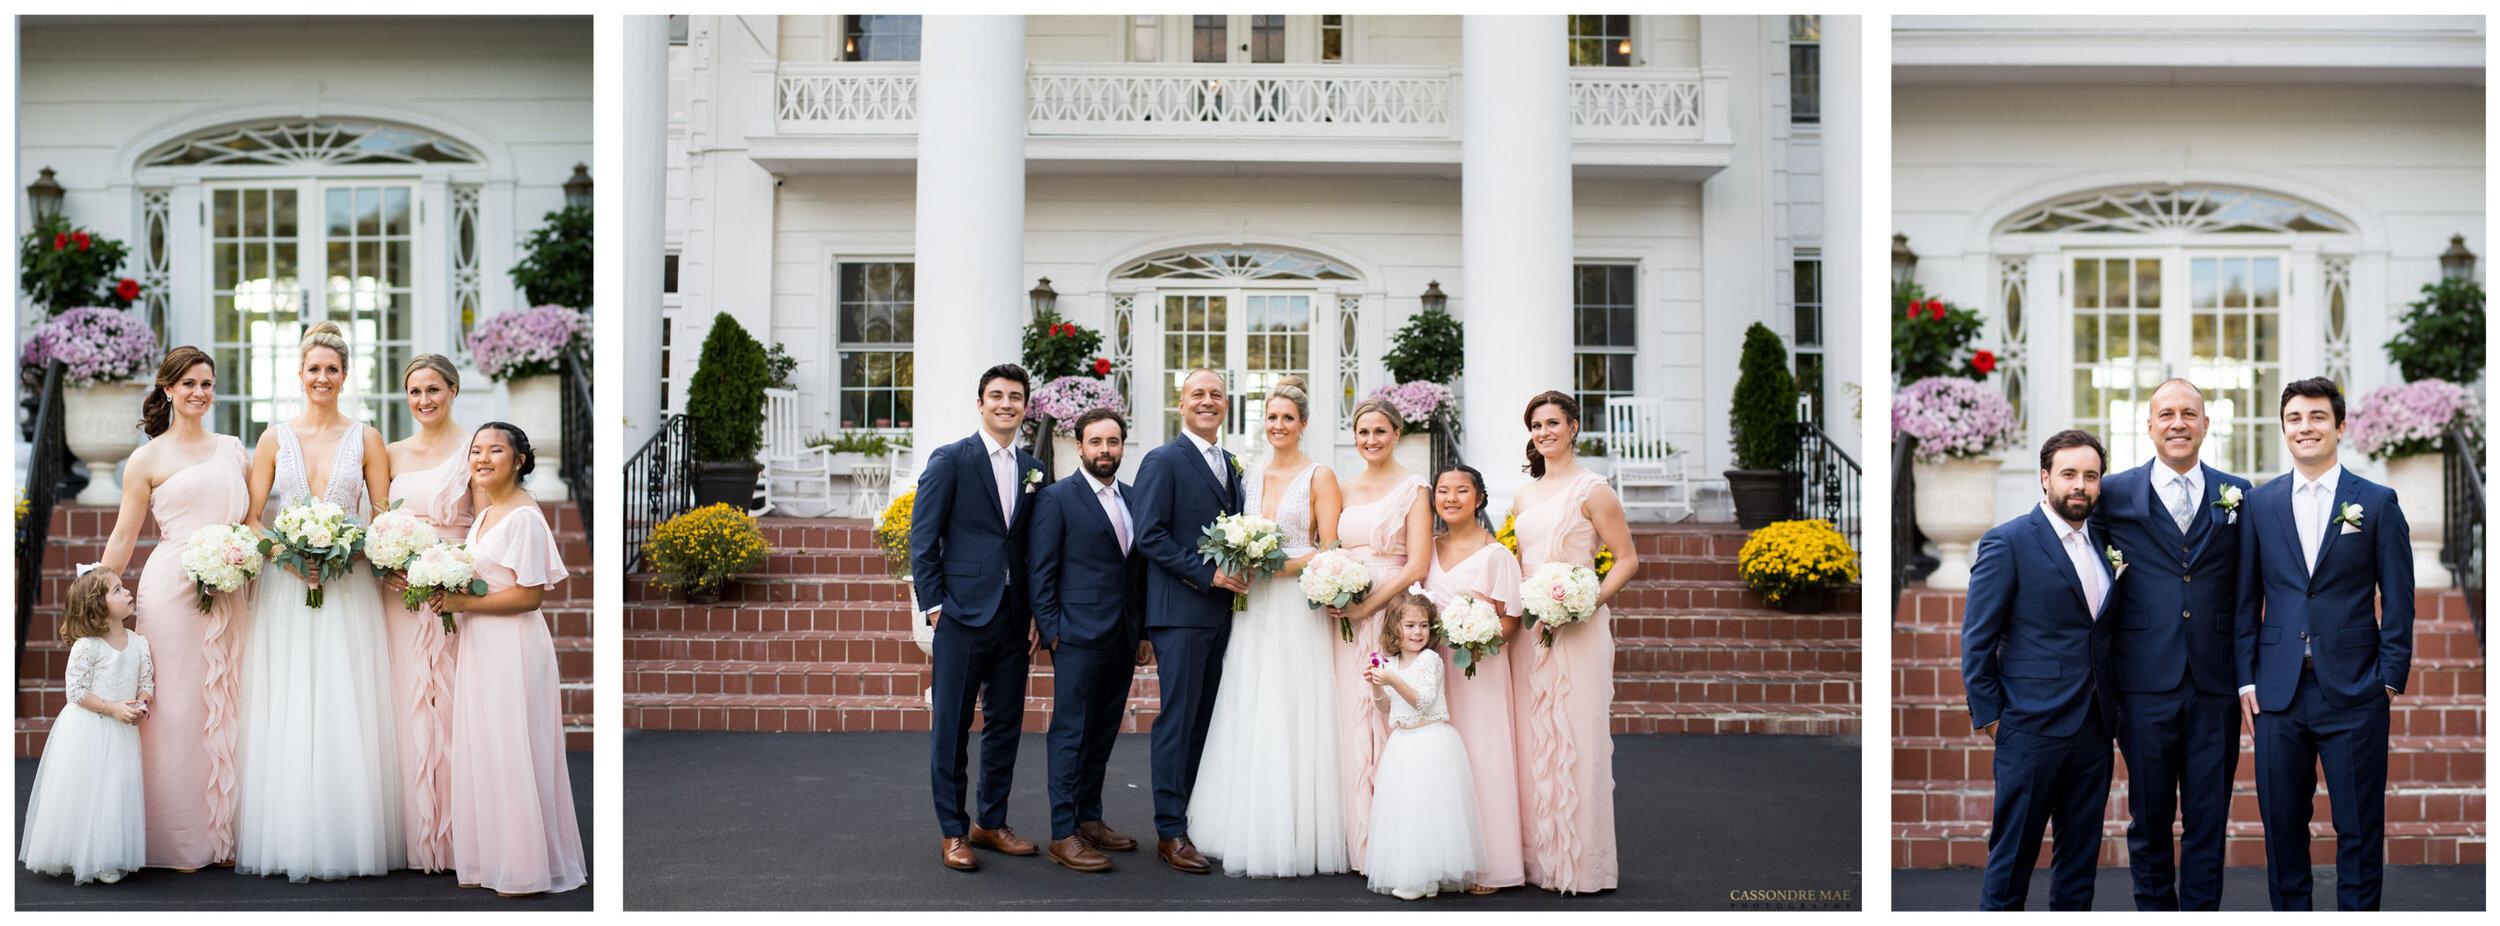 Cassondre Mae Photography Briarcliff Manor Wedding Photographer 18.jpg